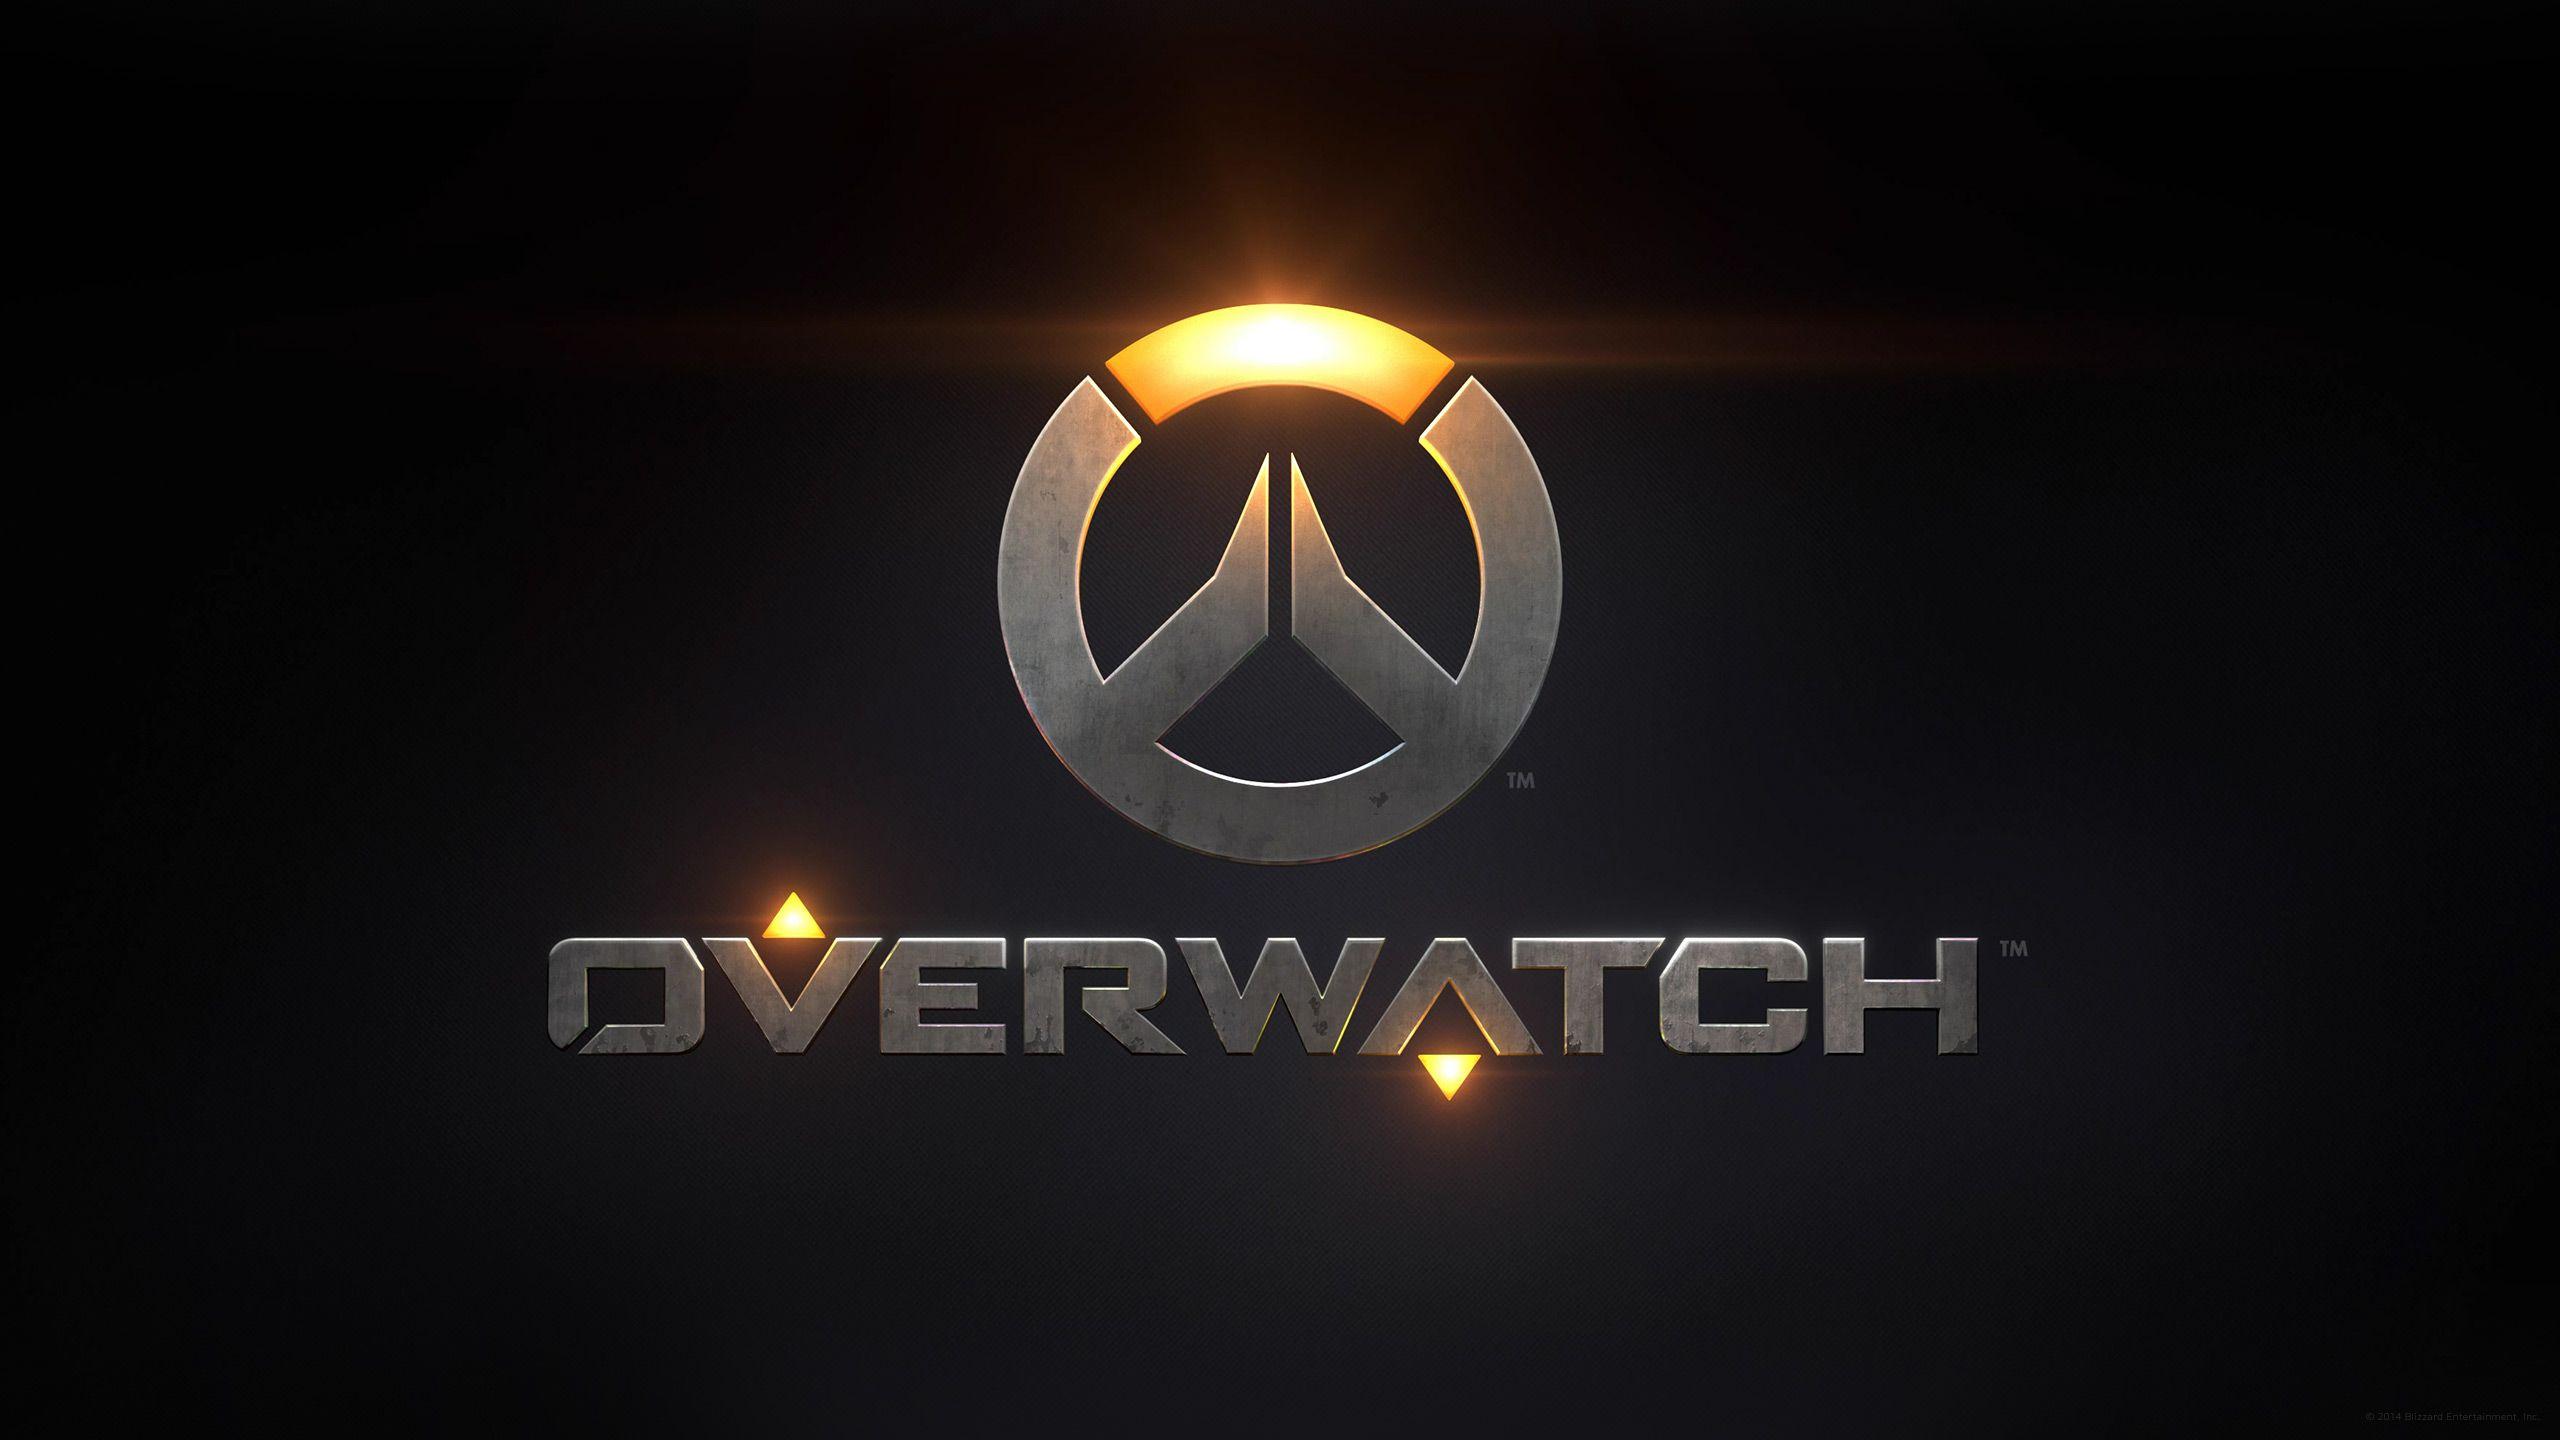 Overwatch Hd Wallpapers Backgrounds Wallpaper 25601440